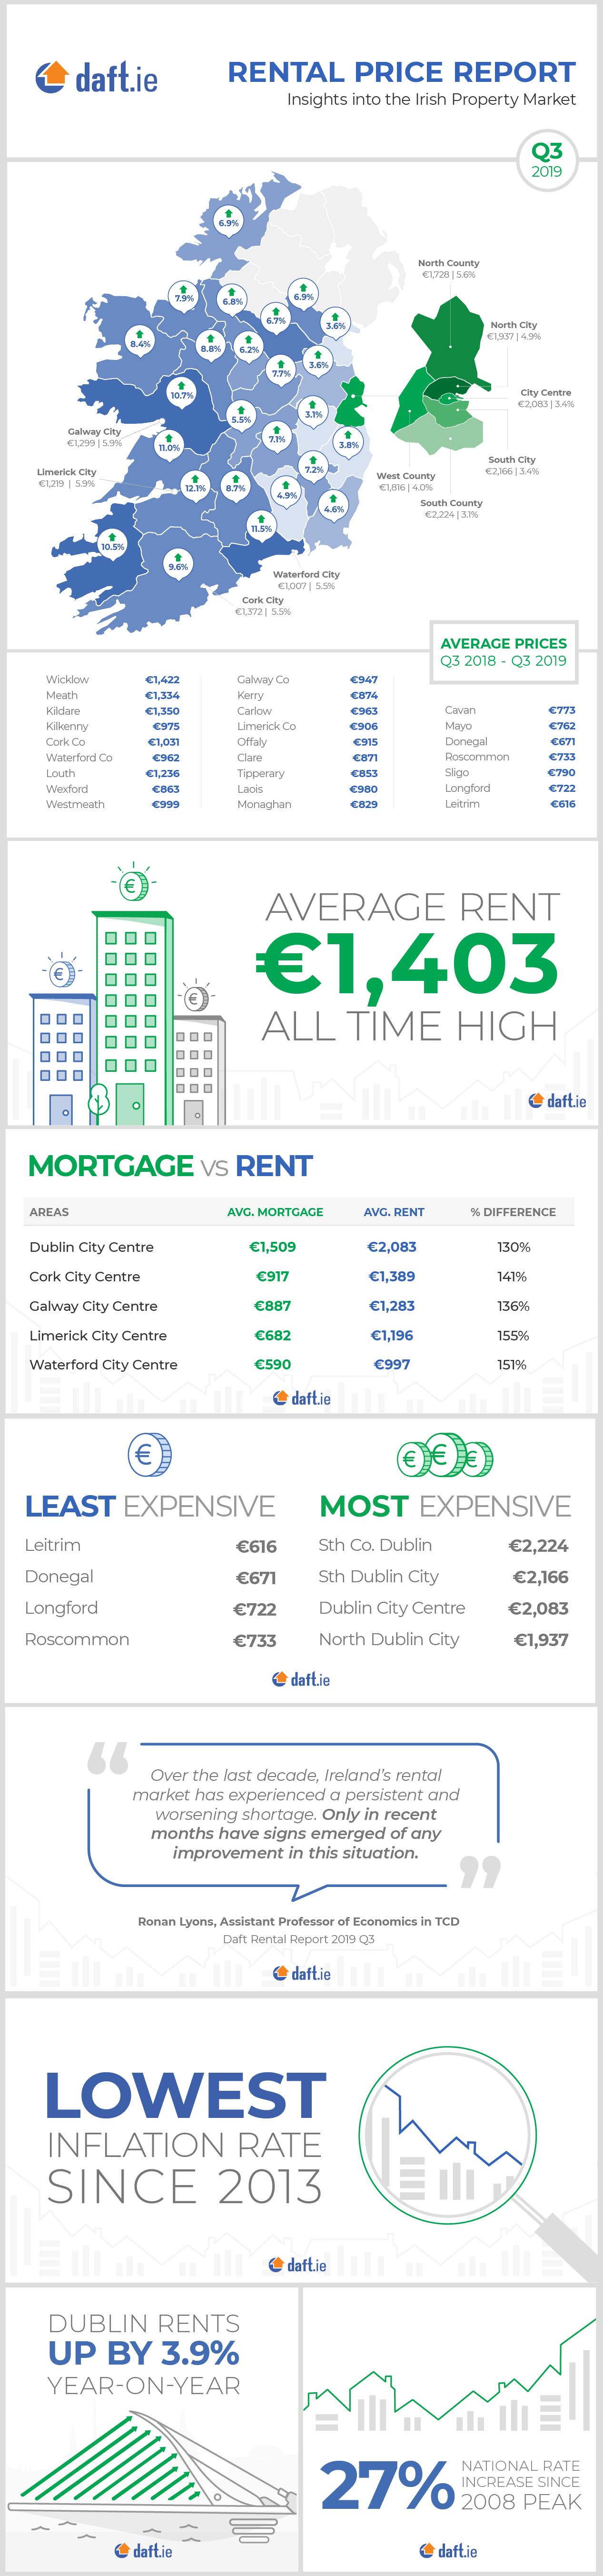 Daft.ie Rental Report: Q3 2019 Infographic